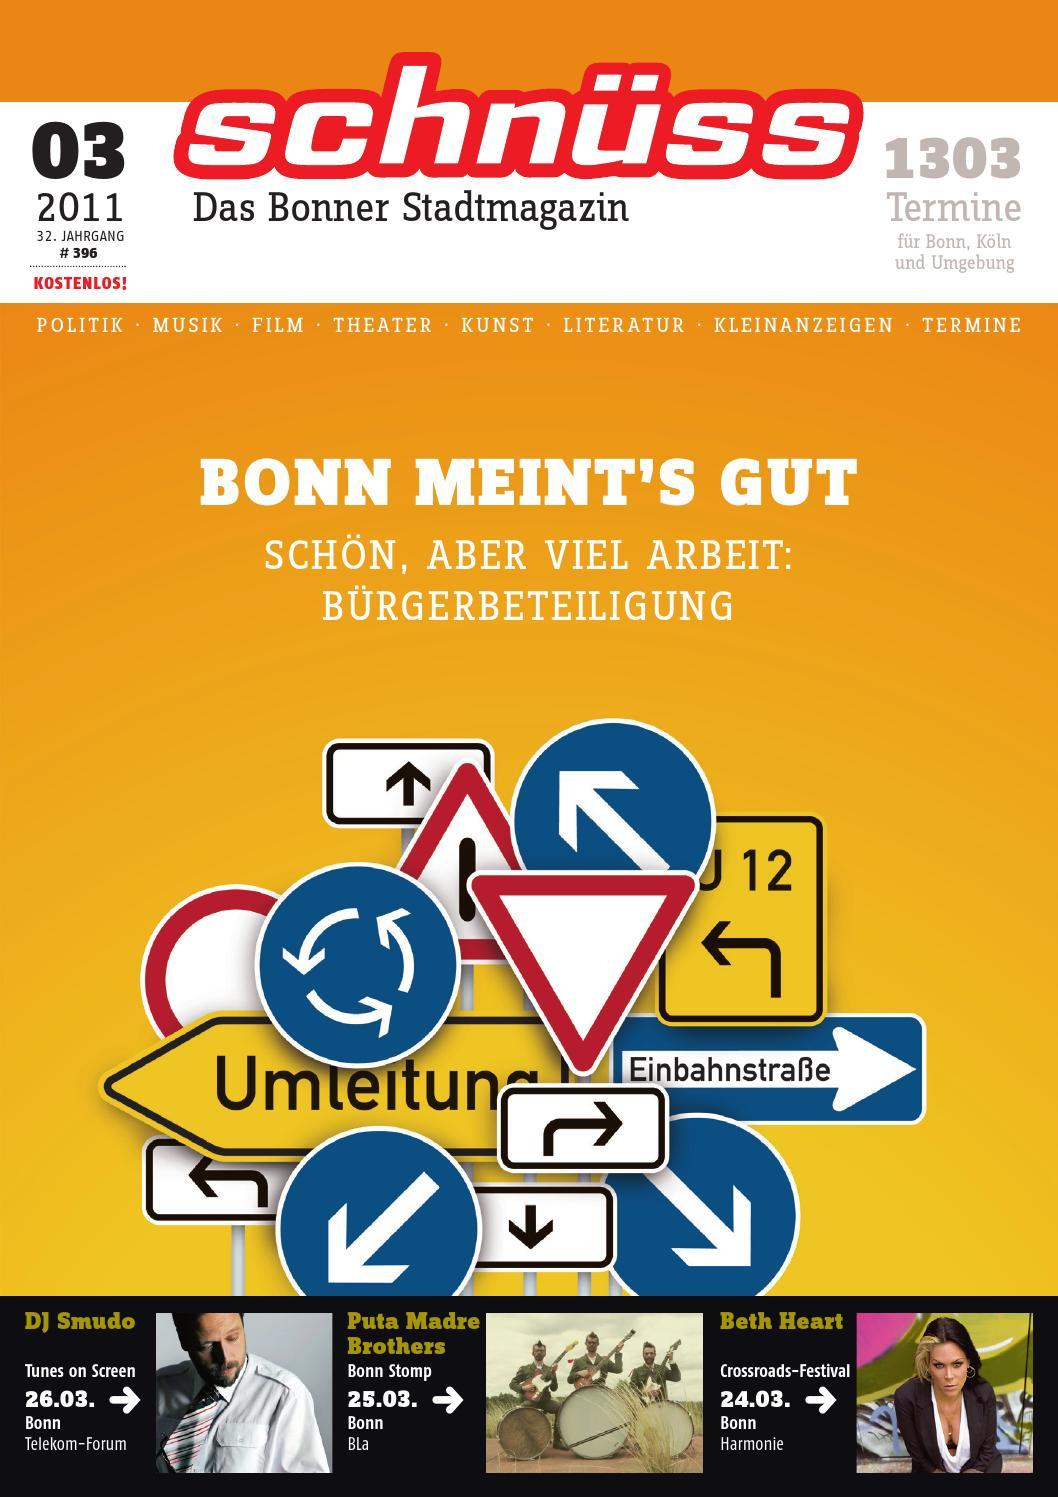 159c12a156a6 Schnüss 2011 03 by Schnüss - Das Bonner Stadtmagazin - issuu